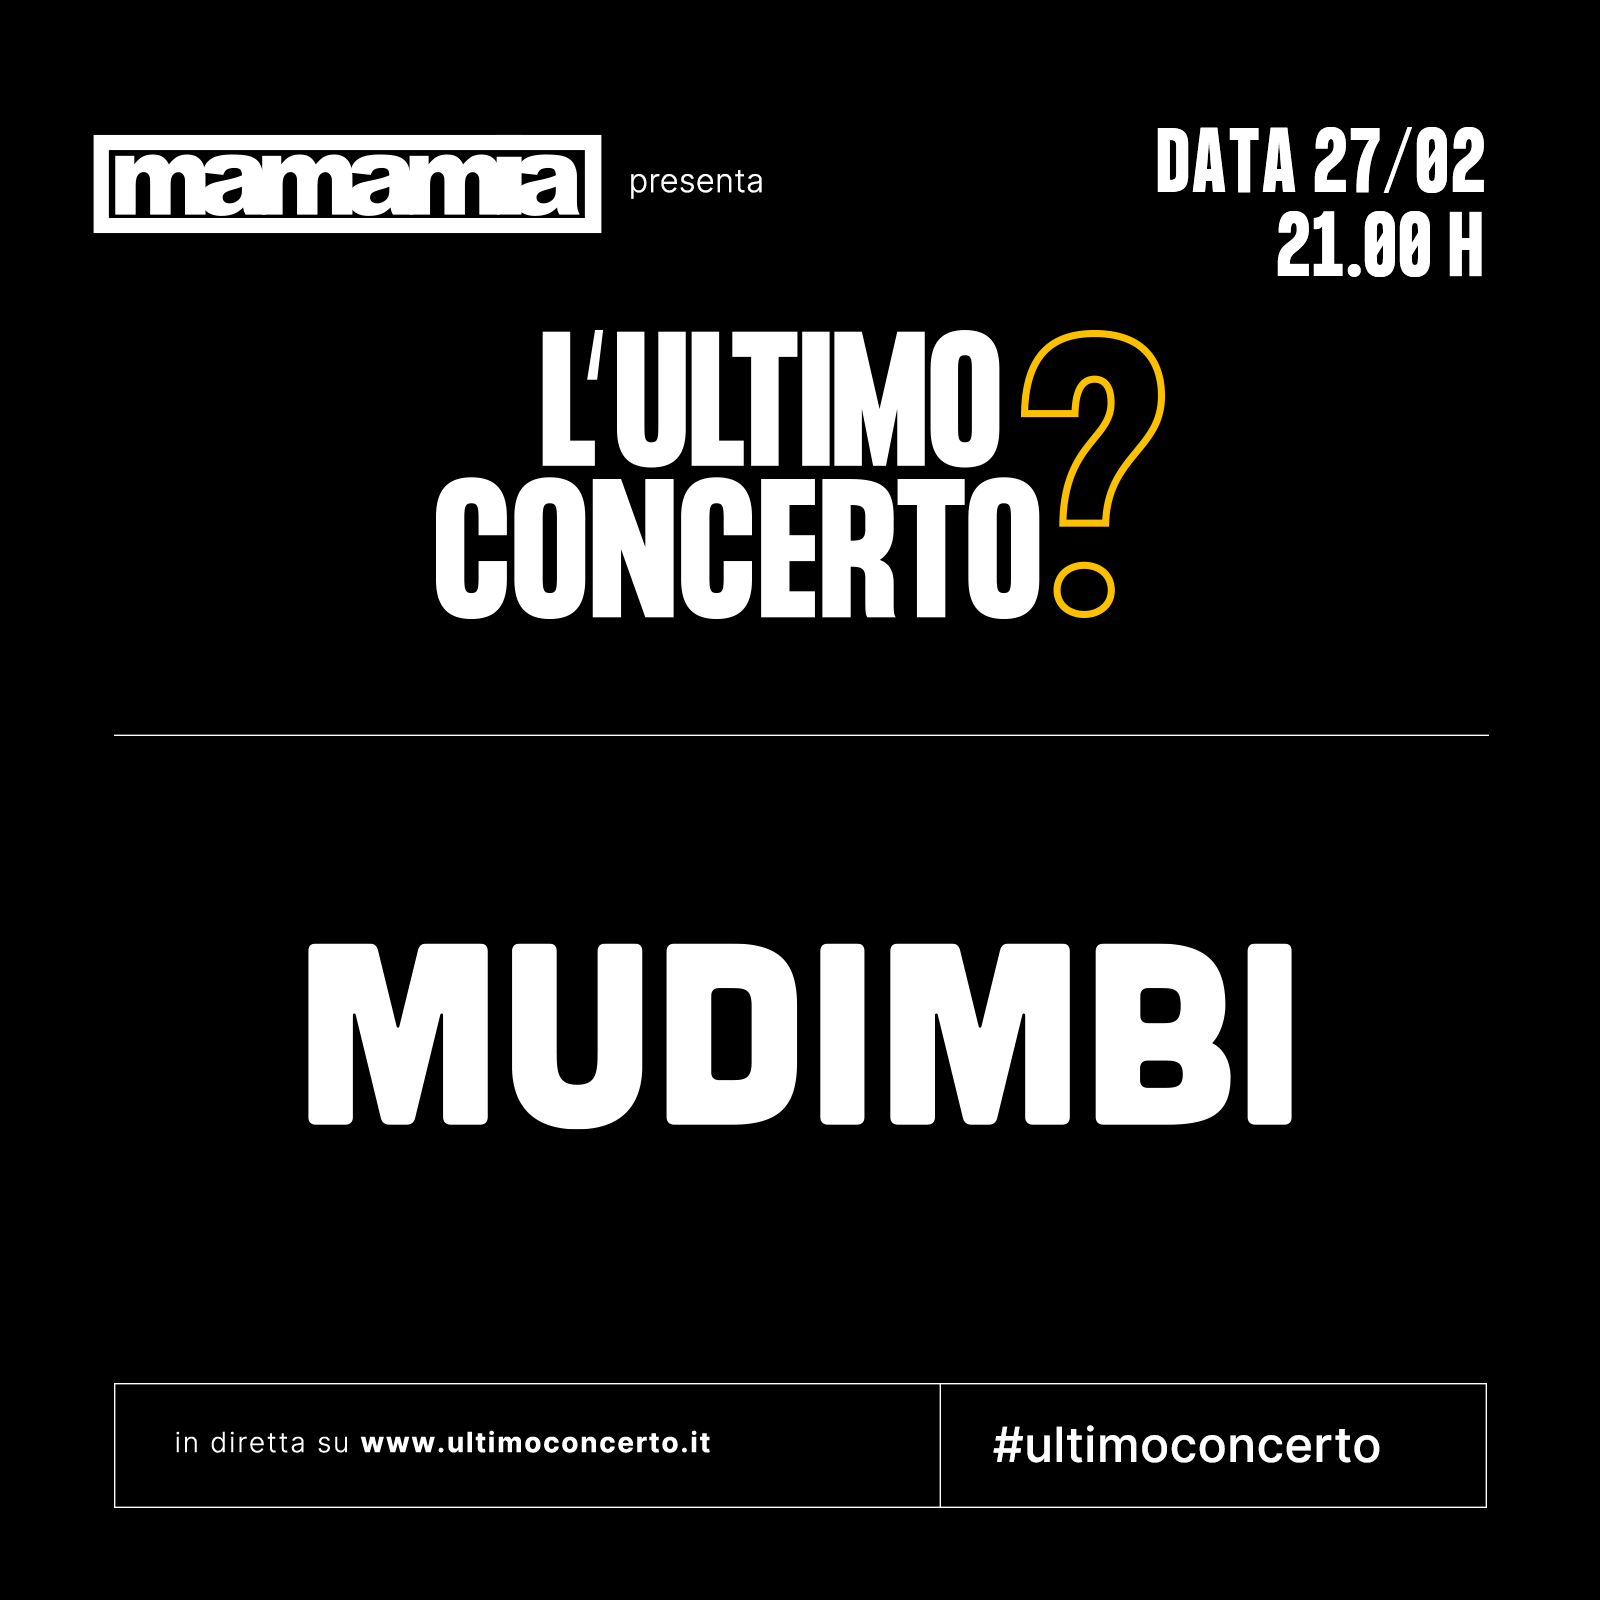 Mudimbi, L'Ultimo Concerto? Discoteca Mamamia di Senigallia